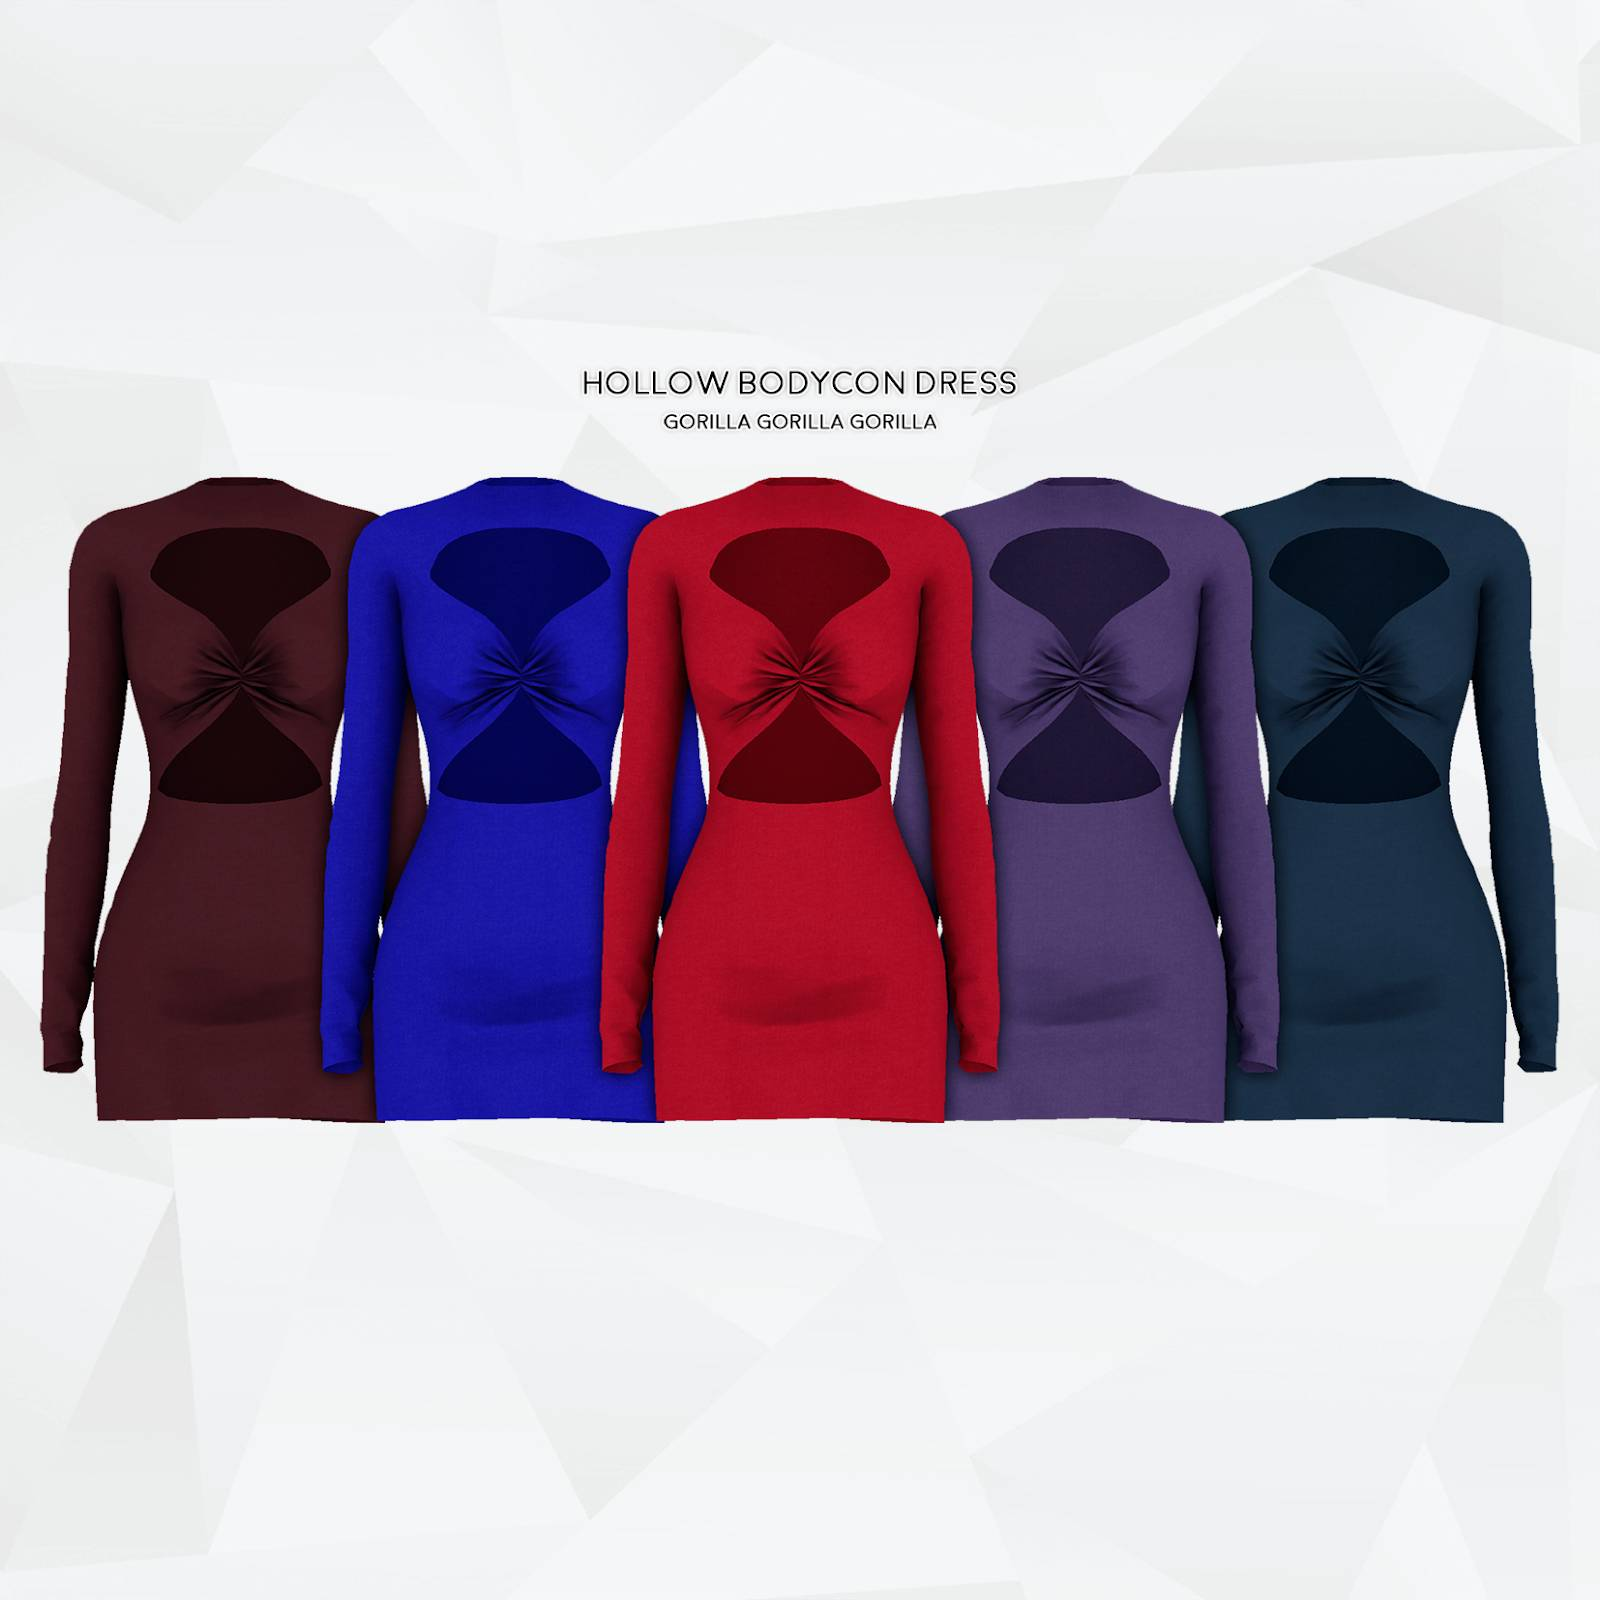 Платье - Hollow Bodycon Dress